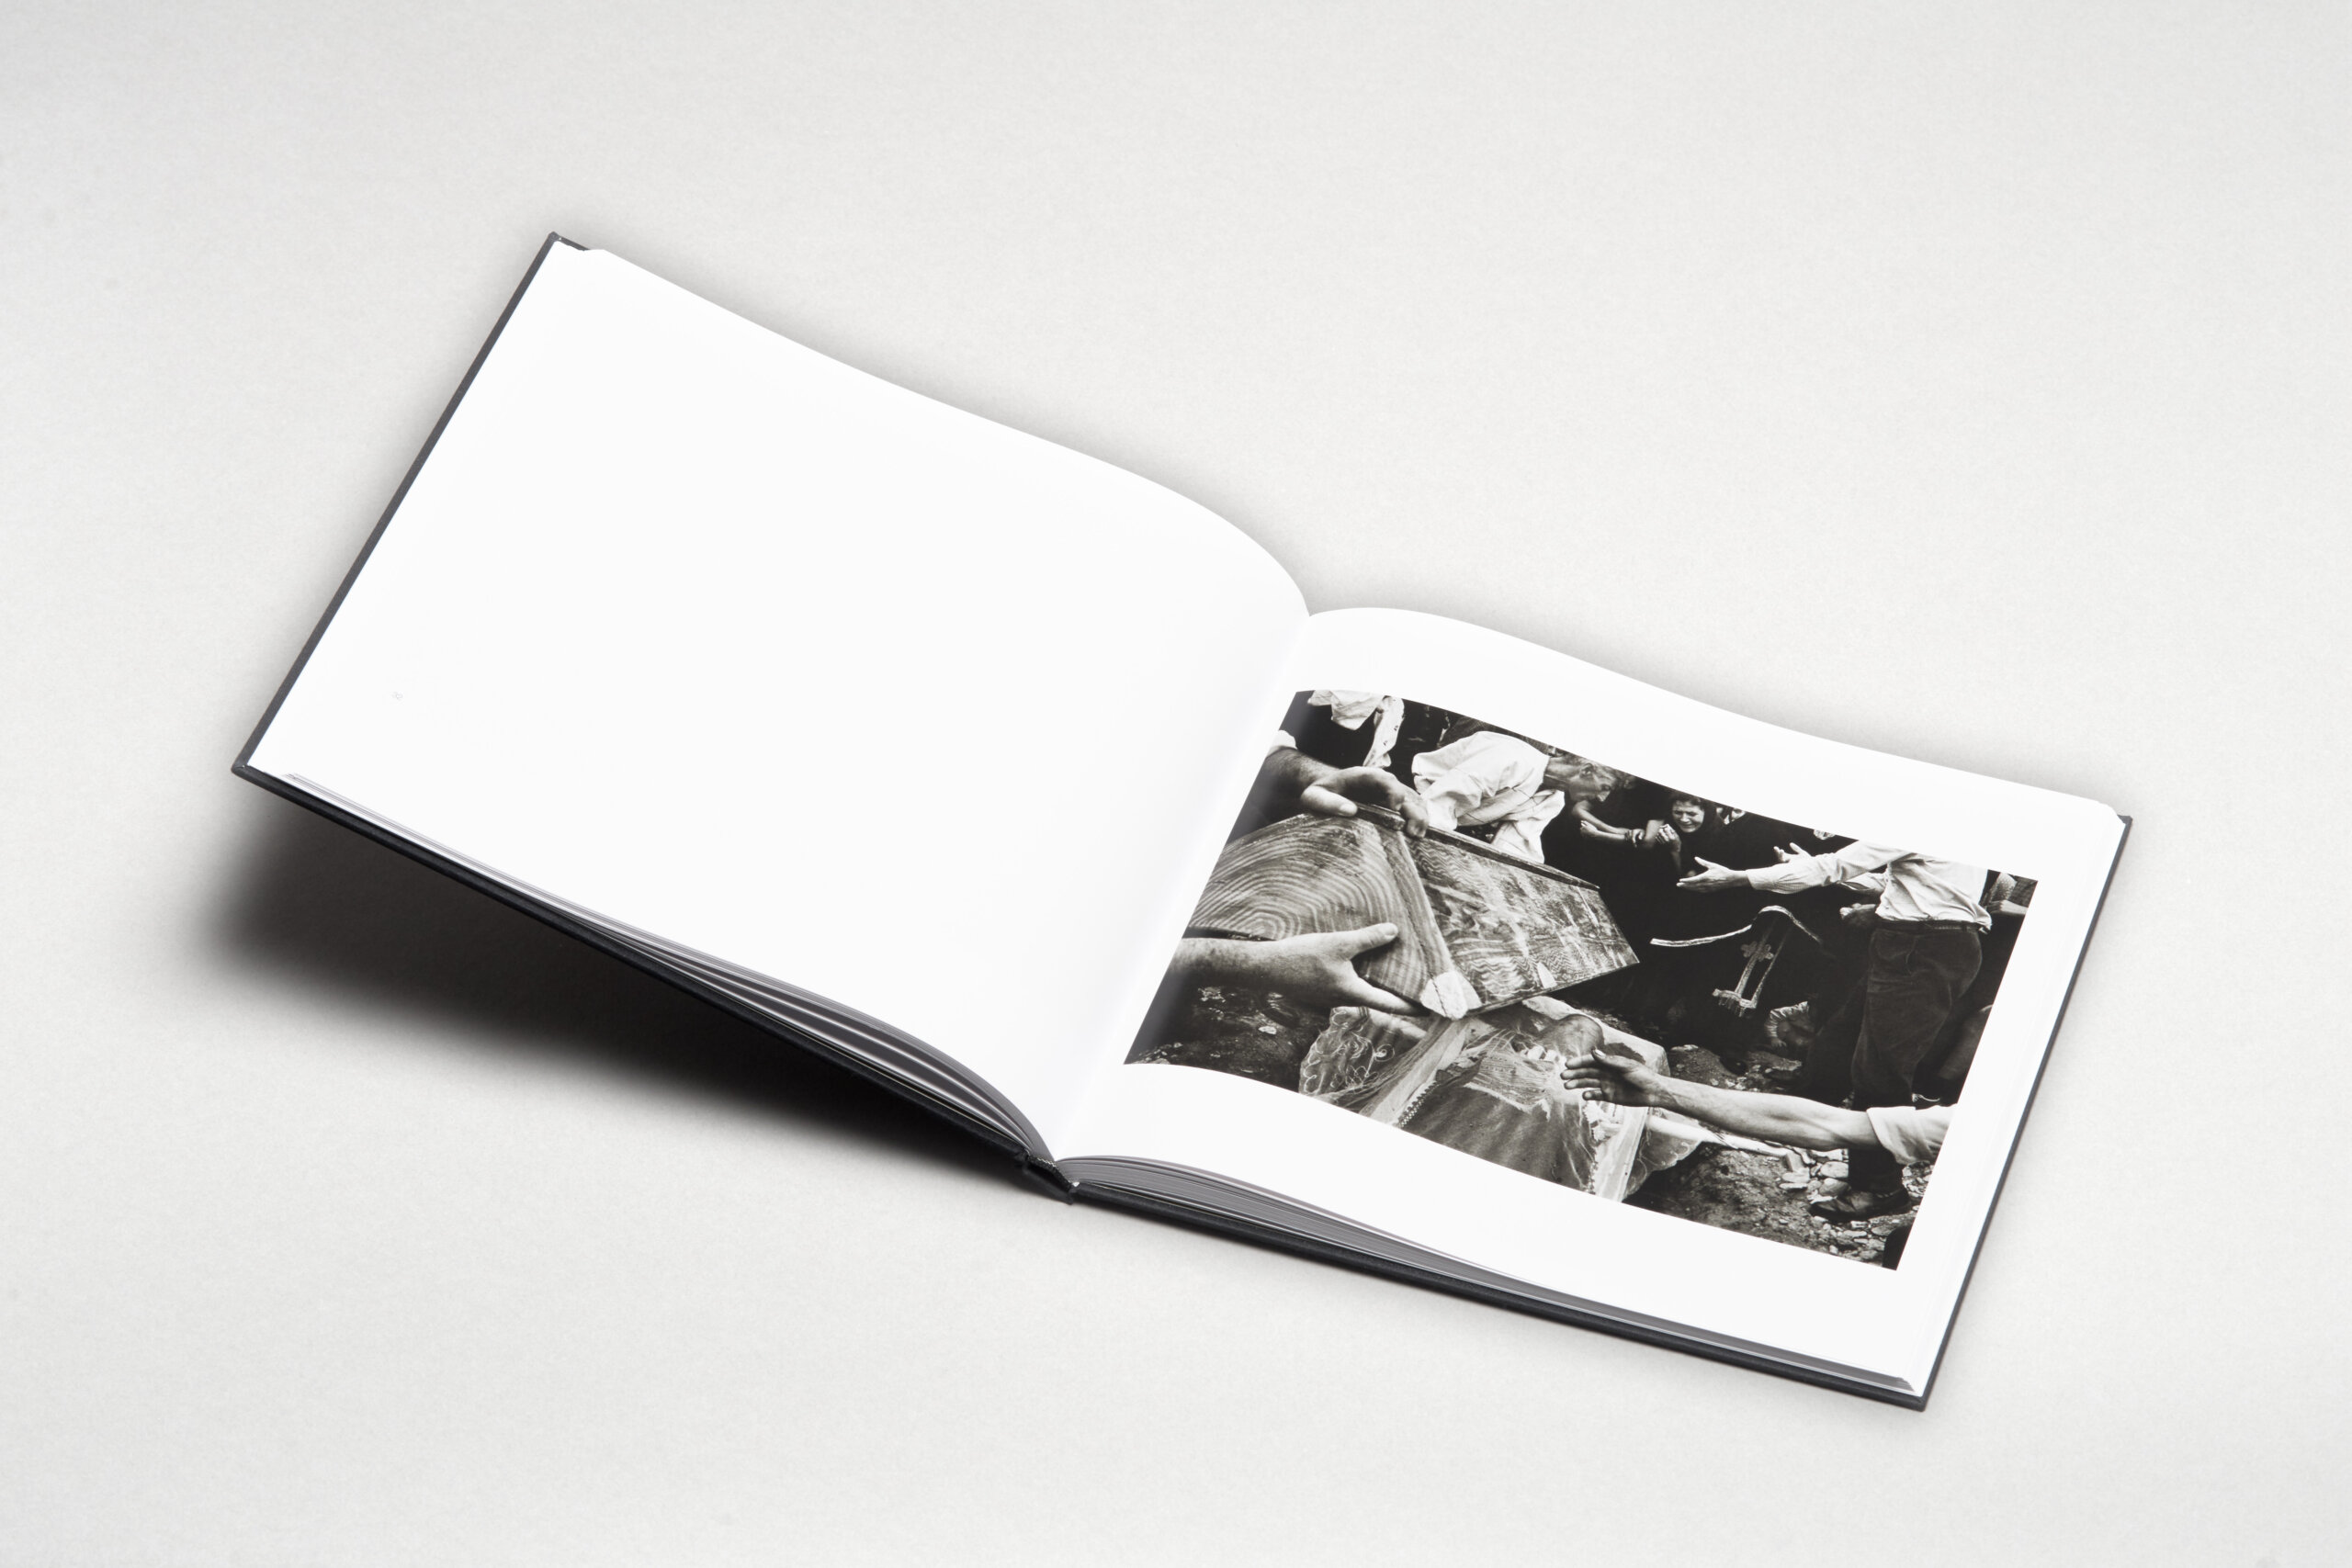 delpire-KOUDELKA-josef-exils